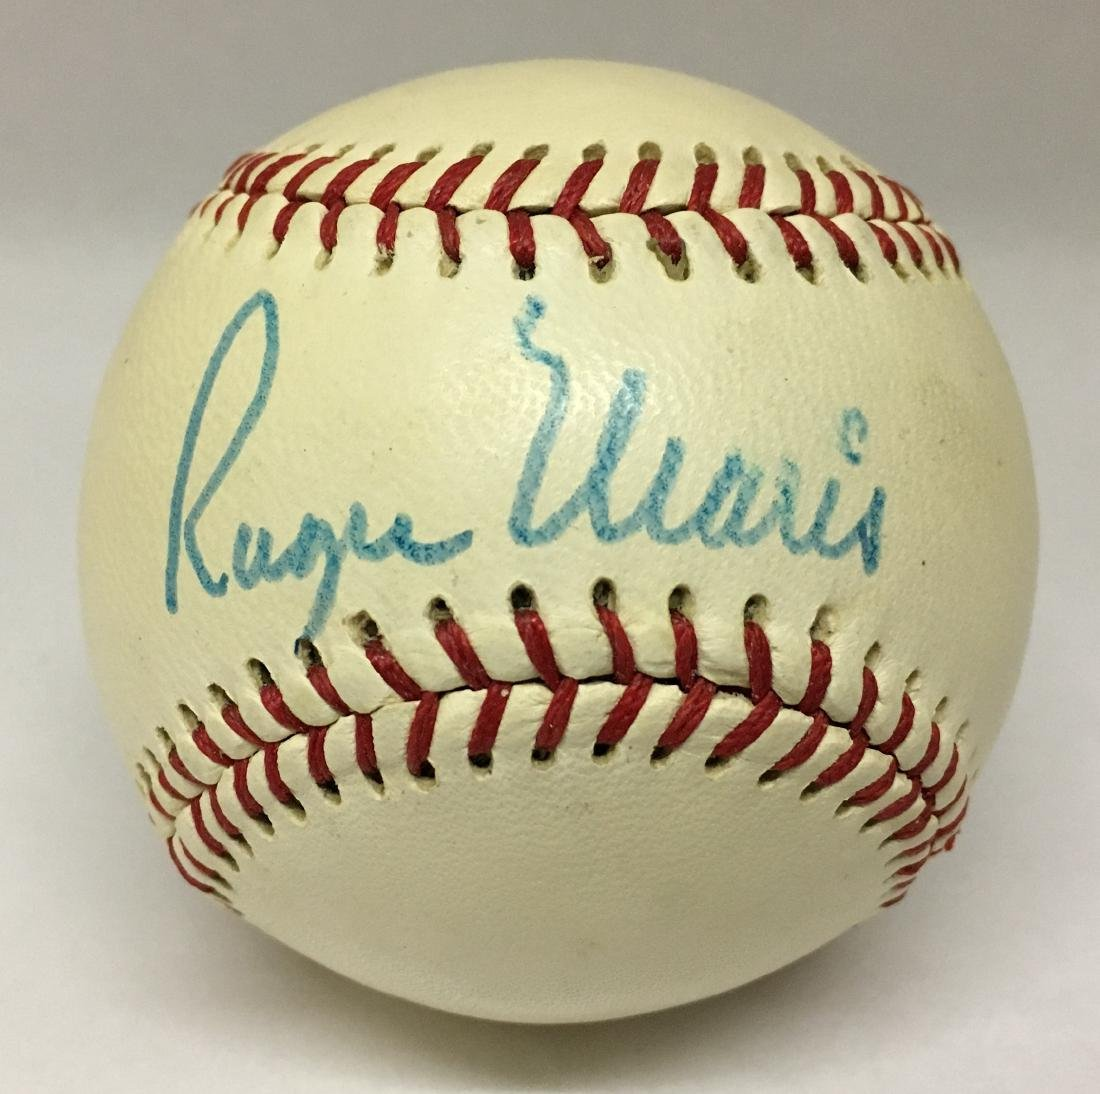 Single Signed Baseball. Roger Maris. JSA.